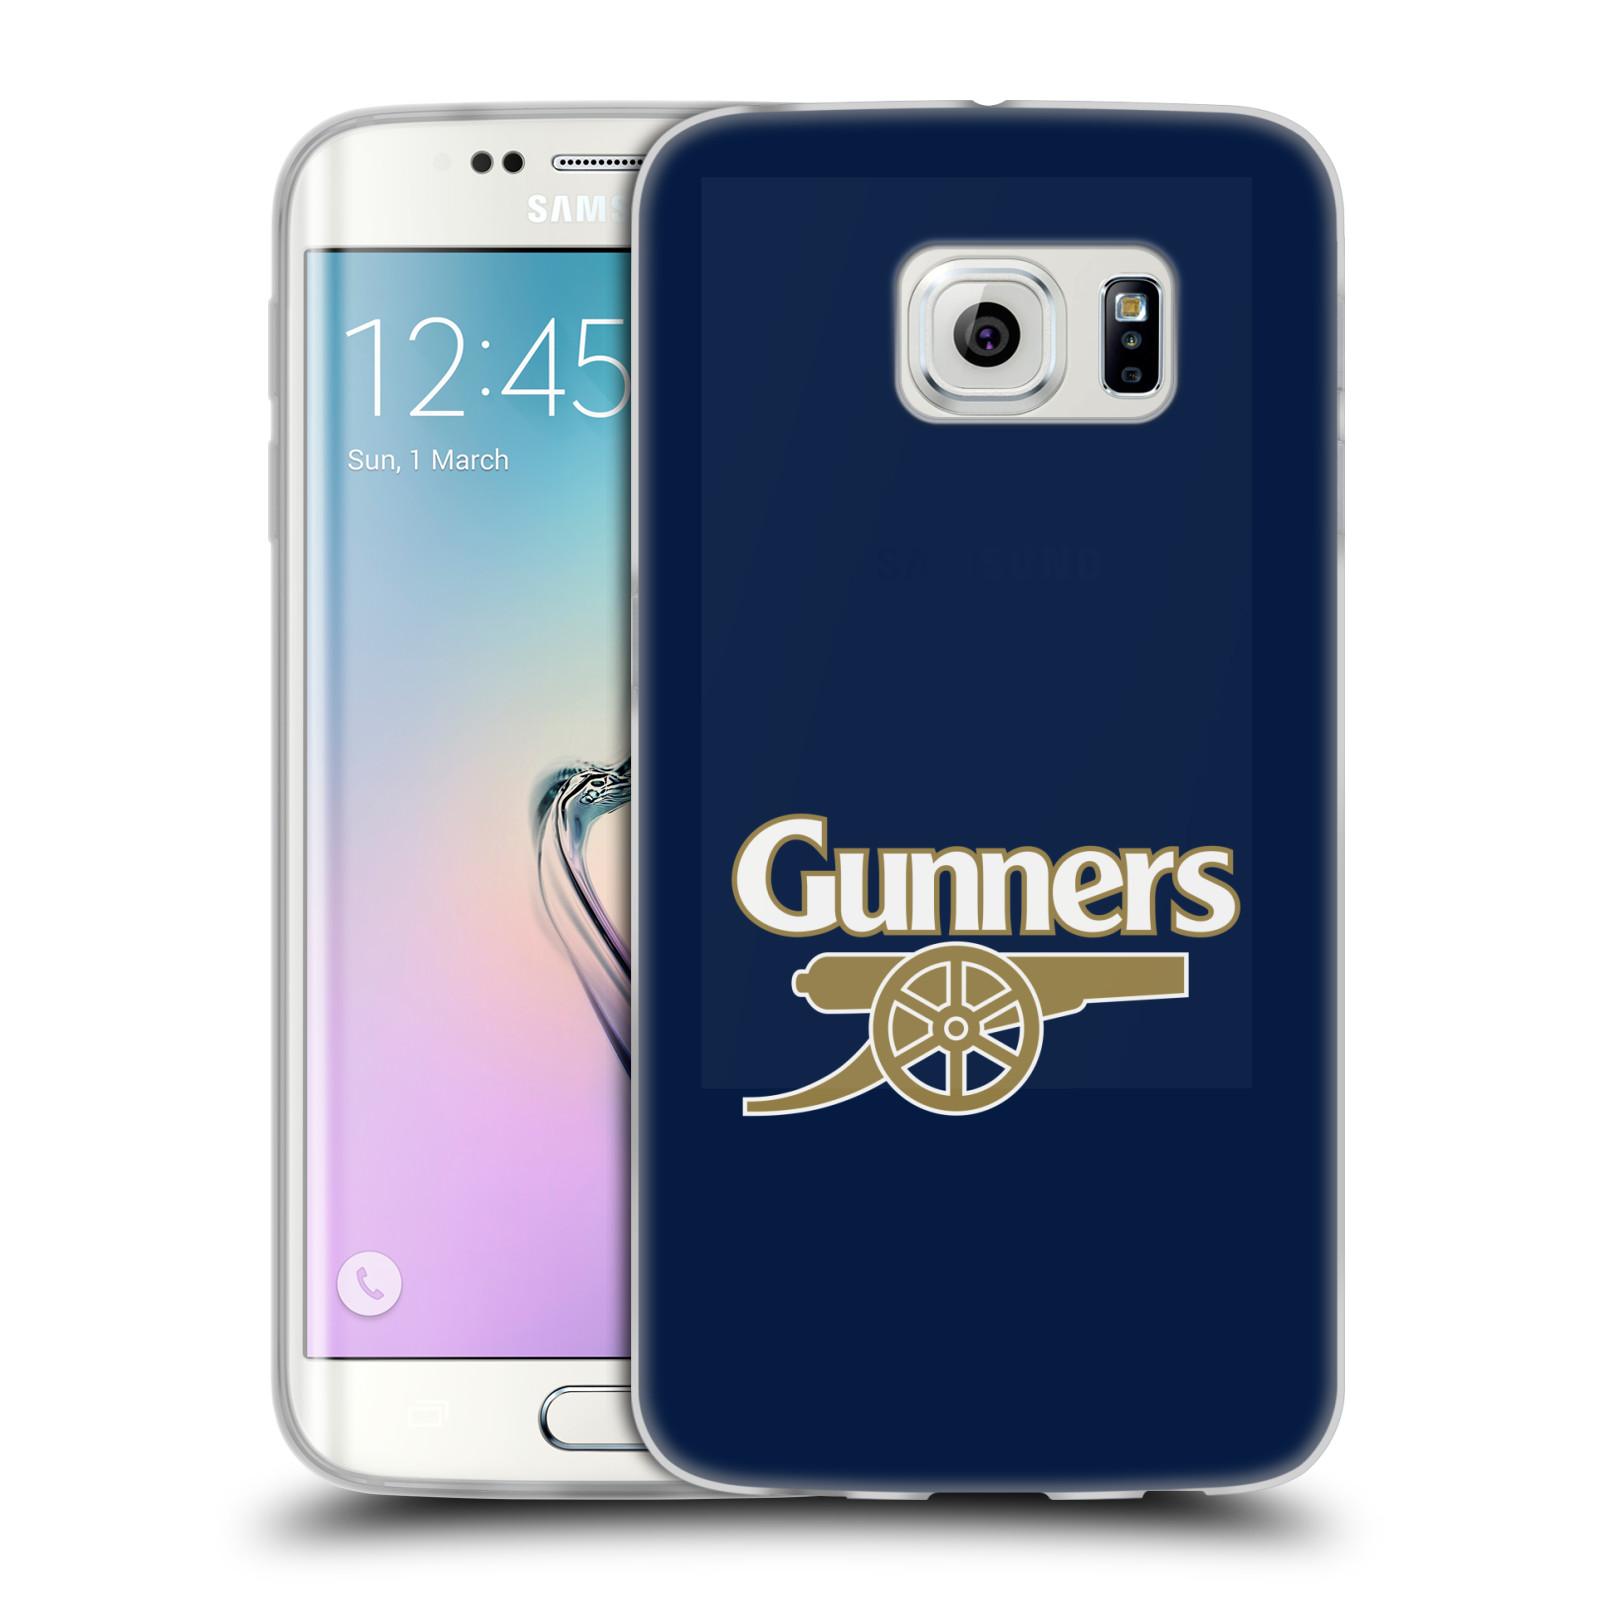 Silikonové pouzdro na mobil Samsung Galaxy S6 Edge - Head Case - Arsenal FC - Gunners